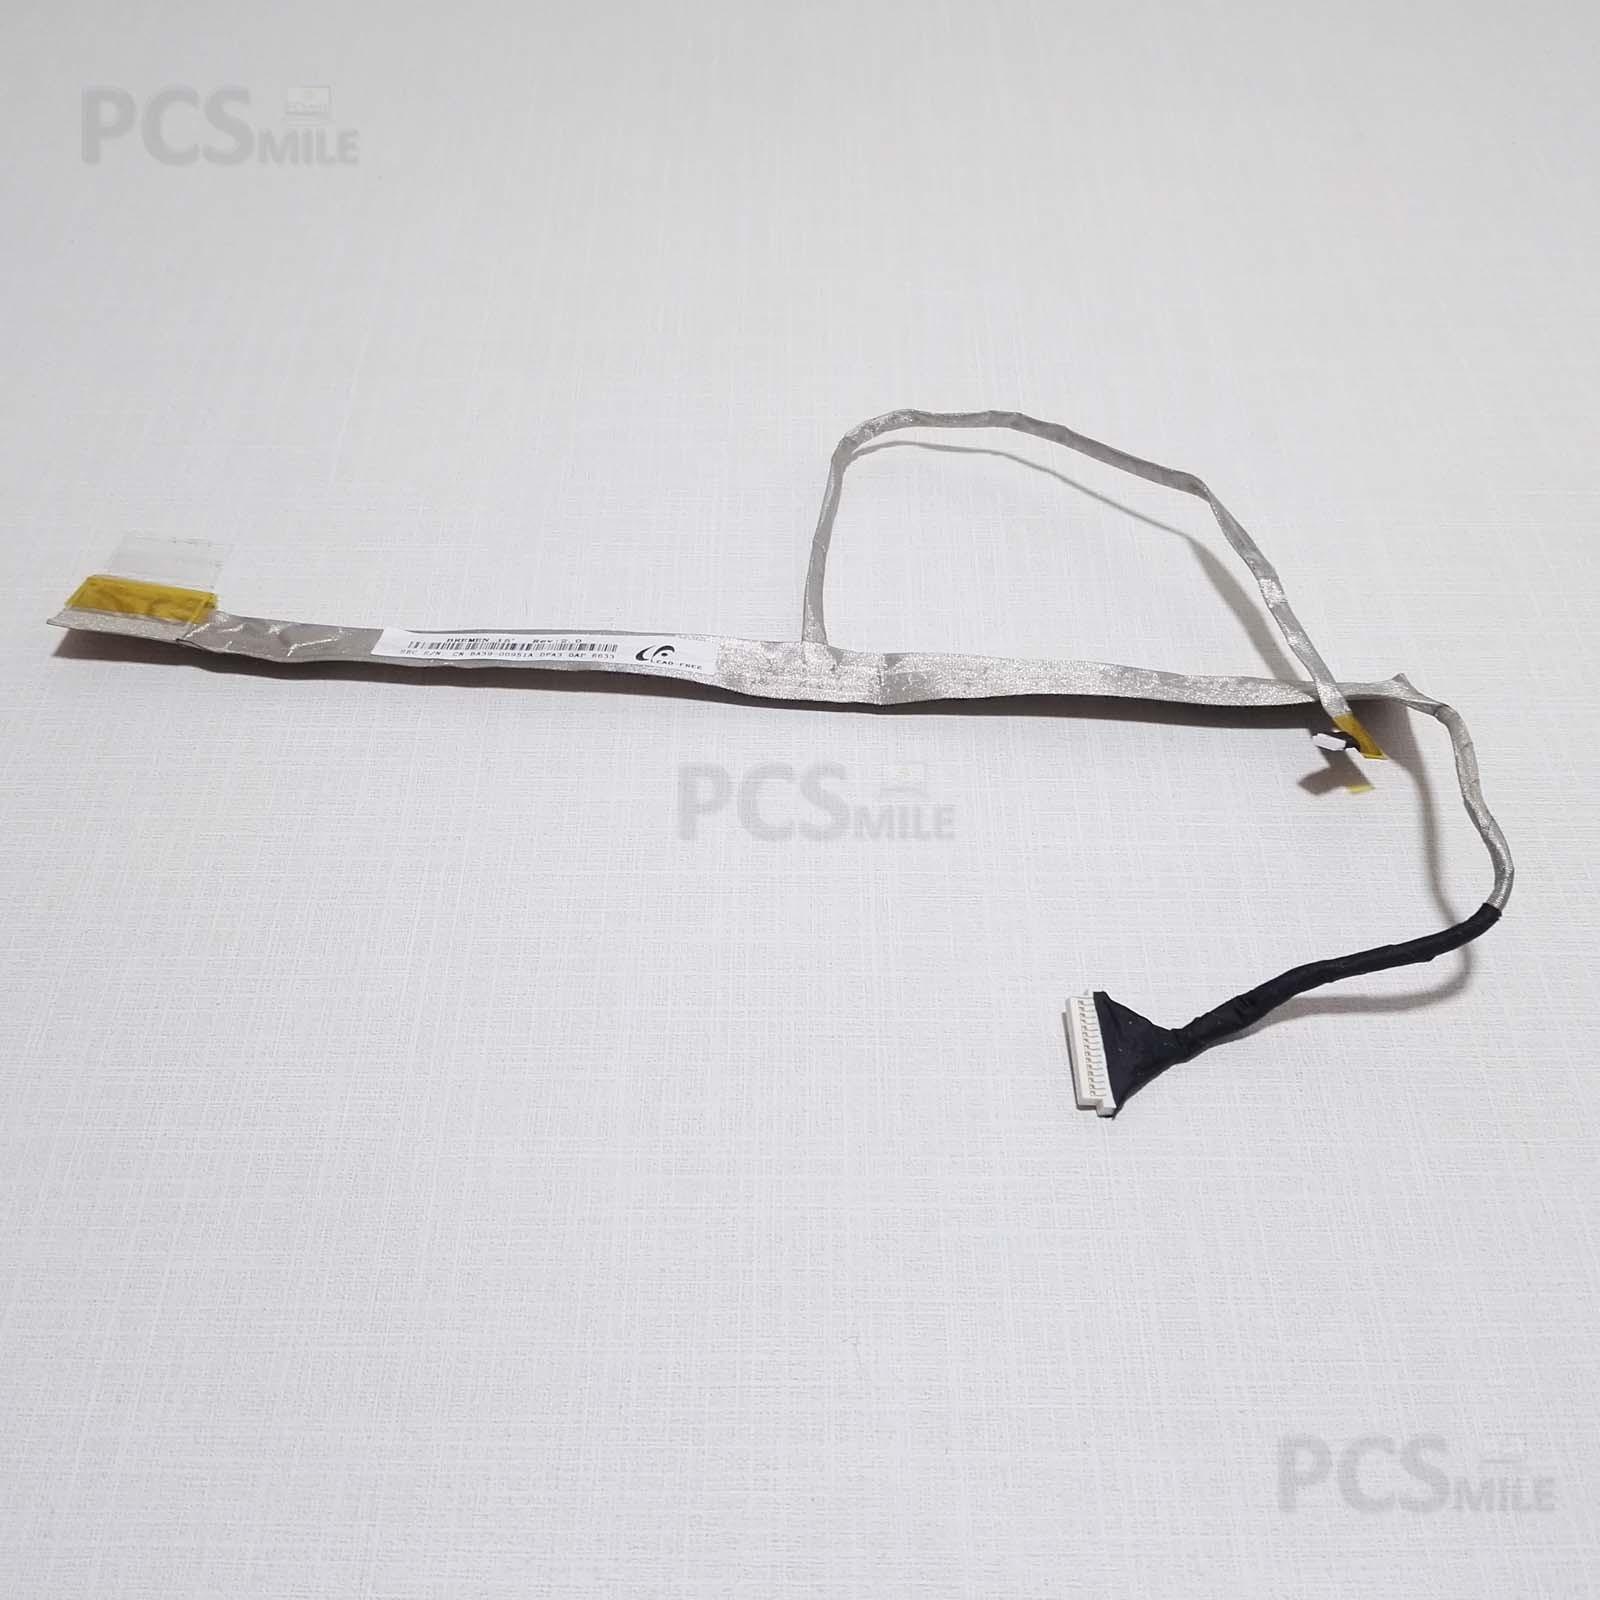 Flat LCD BA39-00951A DFA3 0AP 6633 cevetto webcam Samsung NP-R530